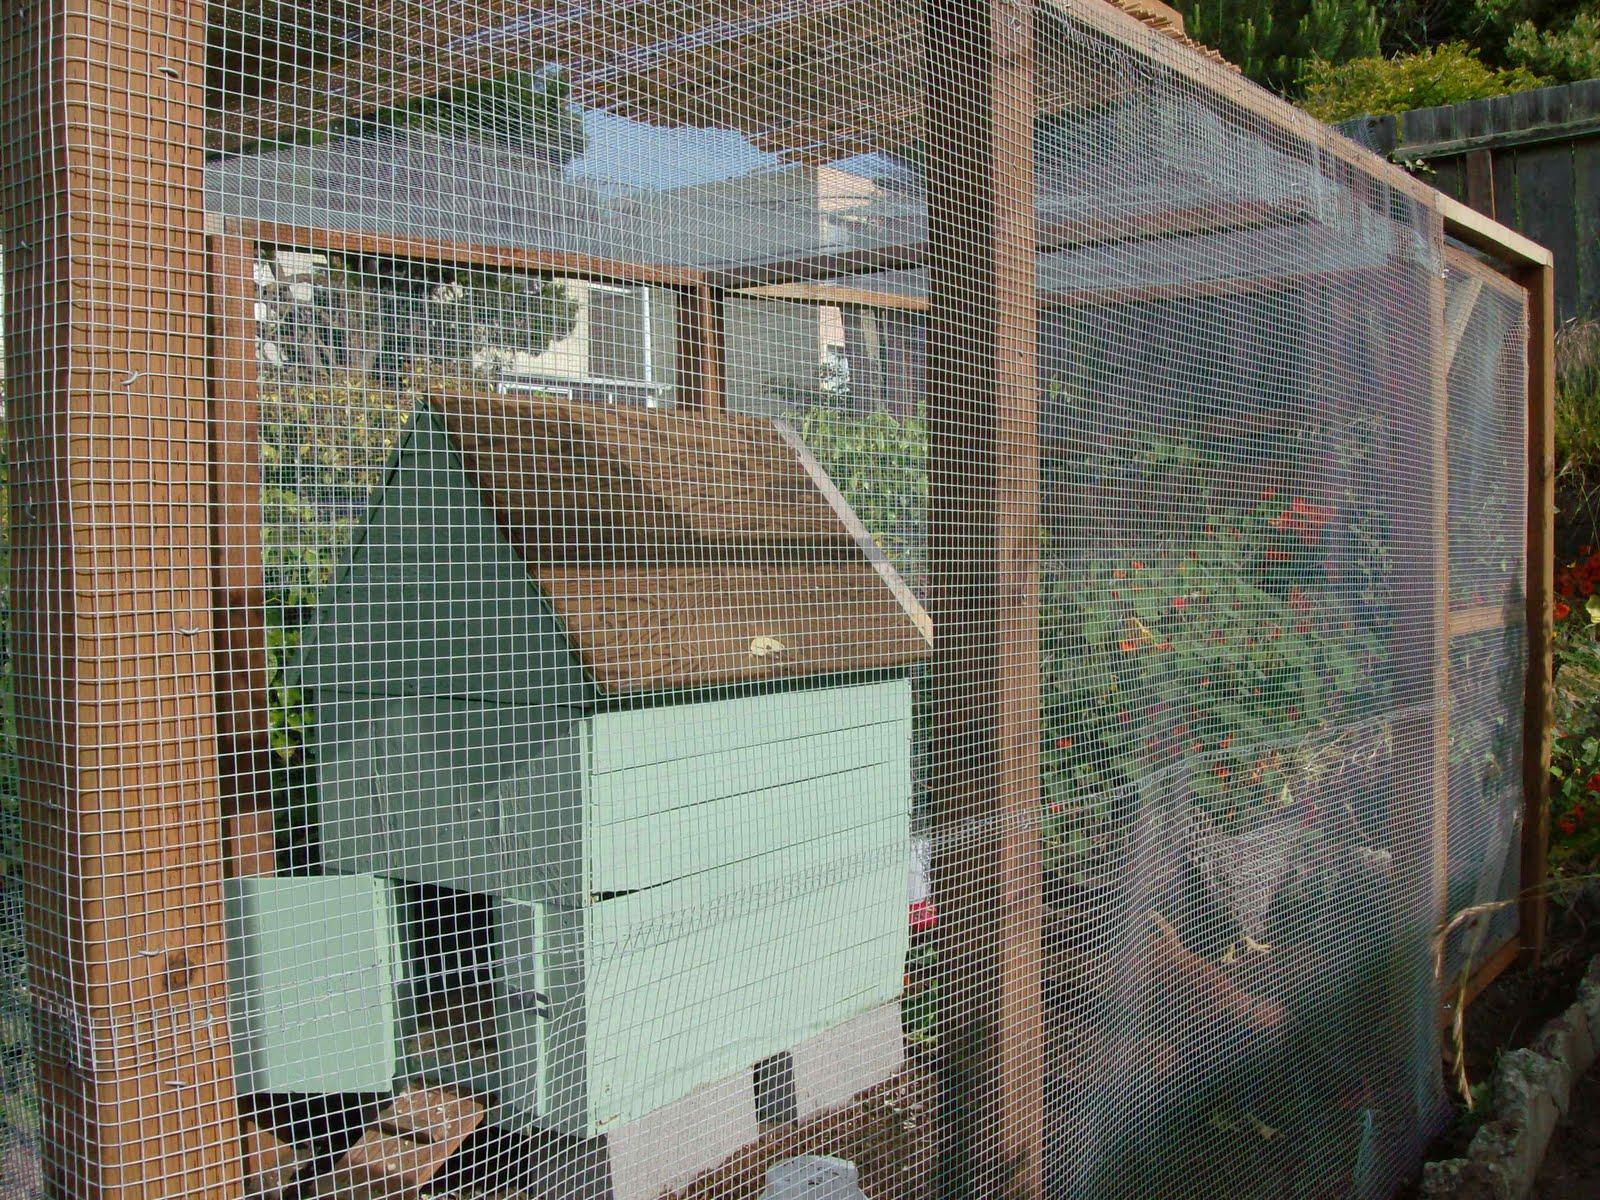 the great backyard chicken adventure part 3 sloat garden center